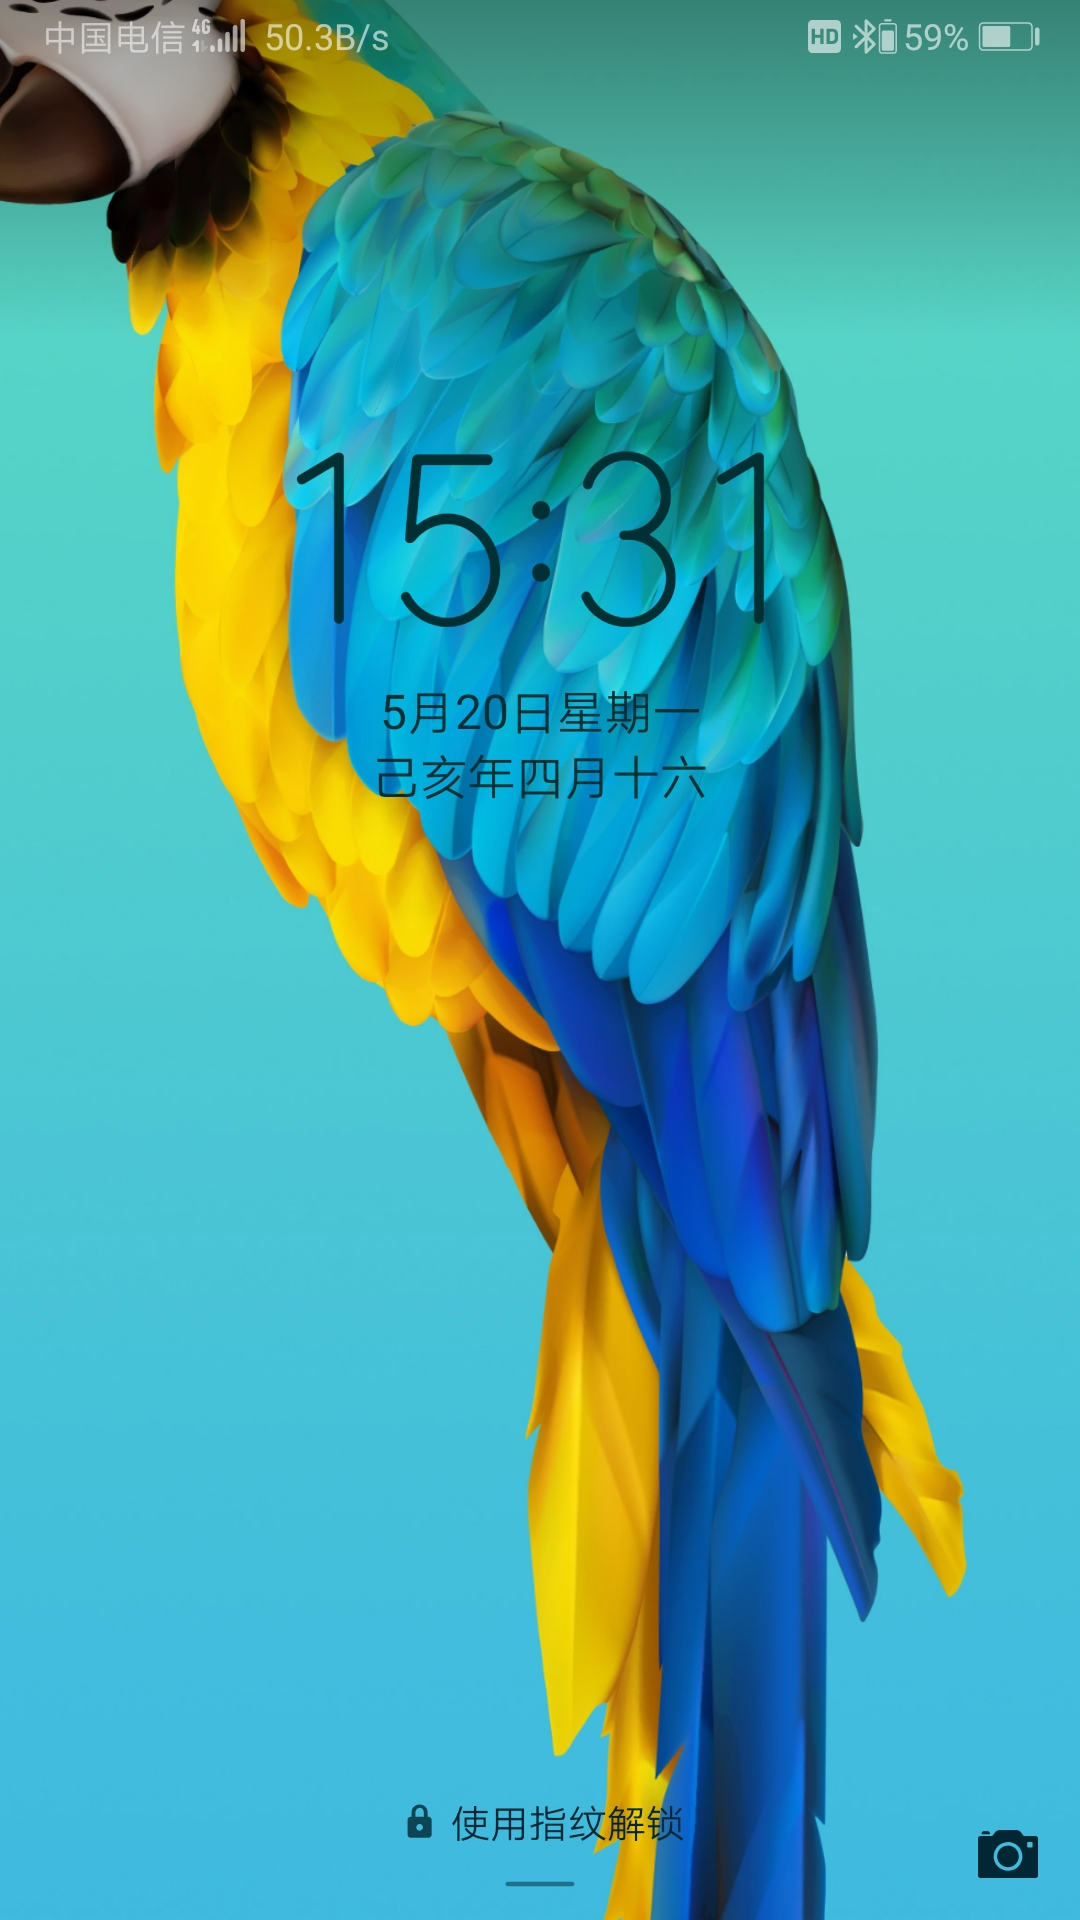 Screenshot_20190520_153135_com.android.keyguard.jpg